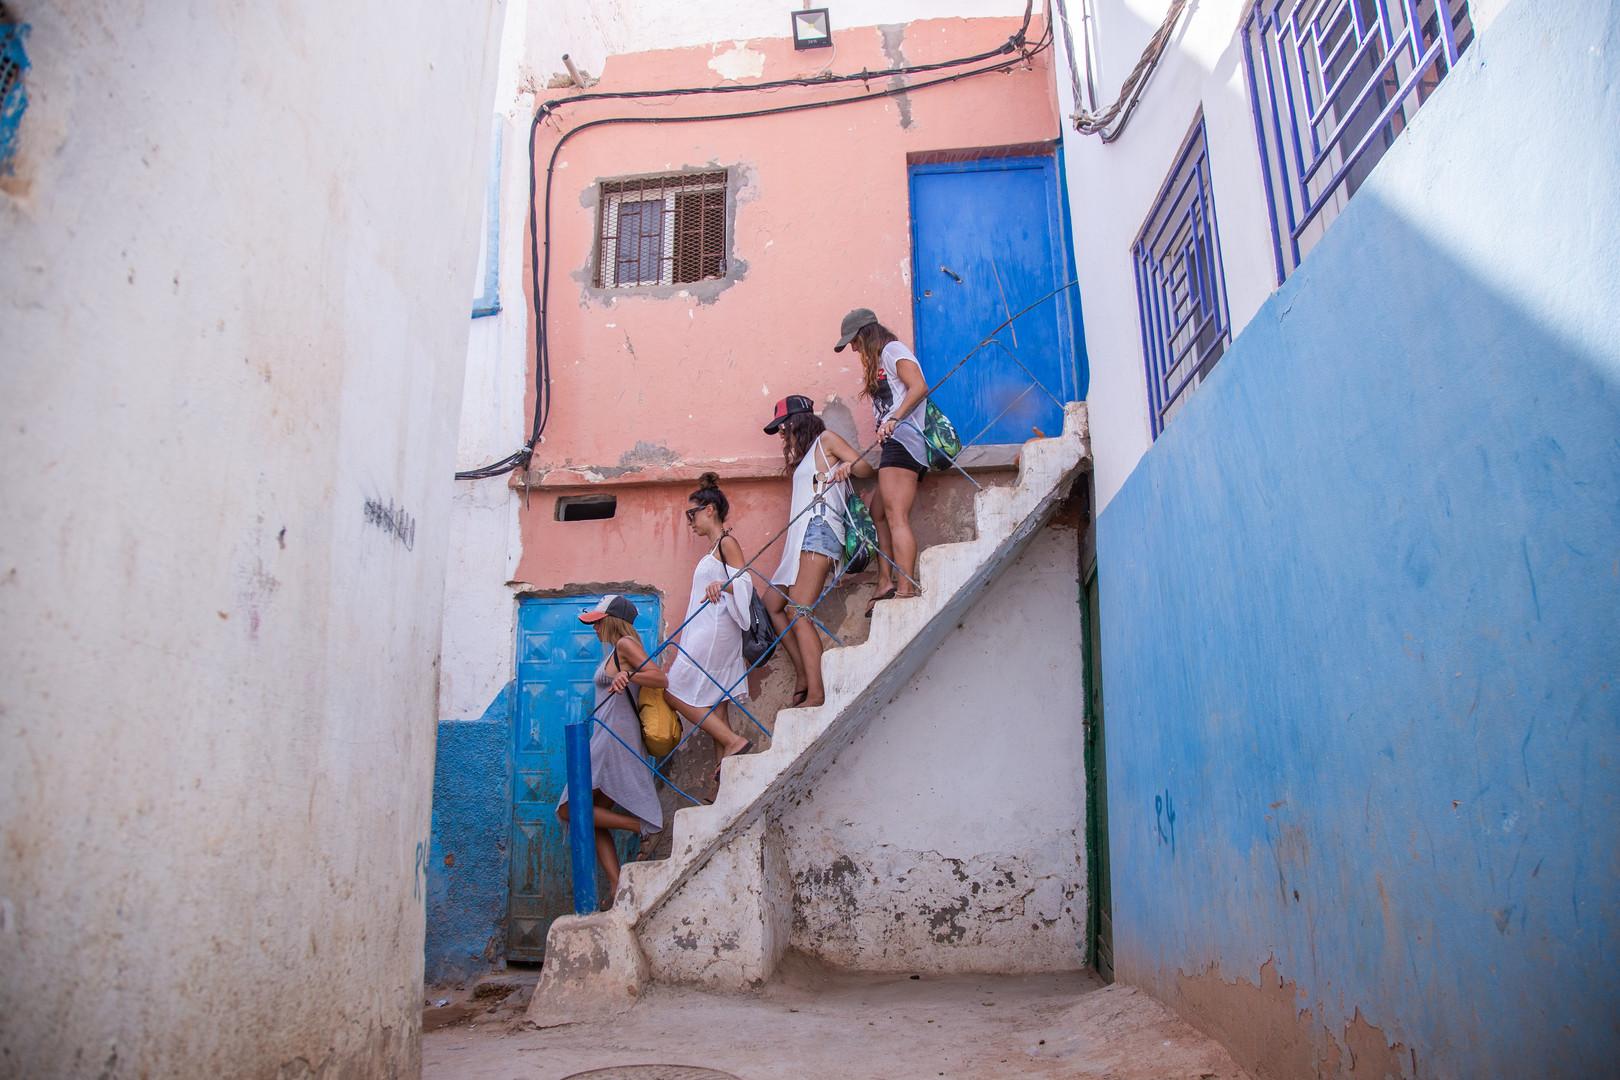 ActiveMorocco-181014-0926.jpg